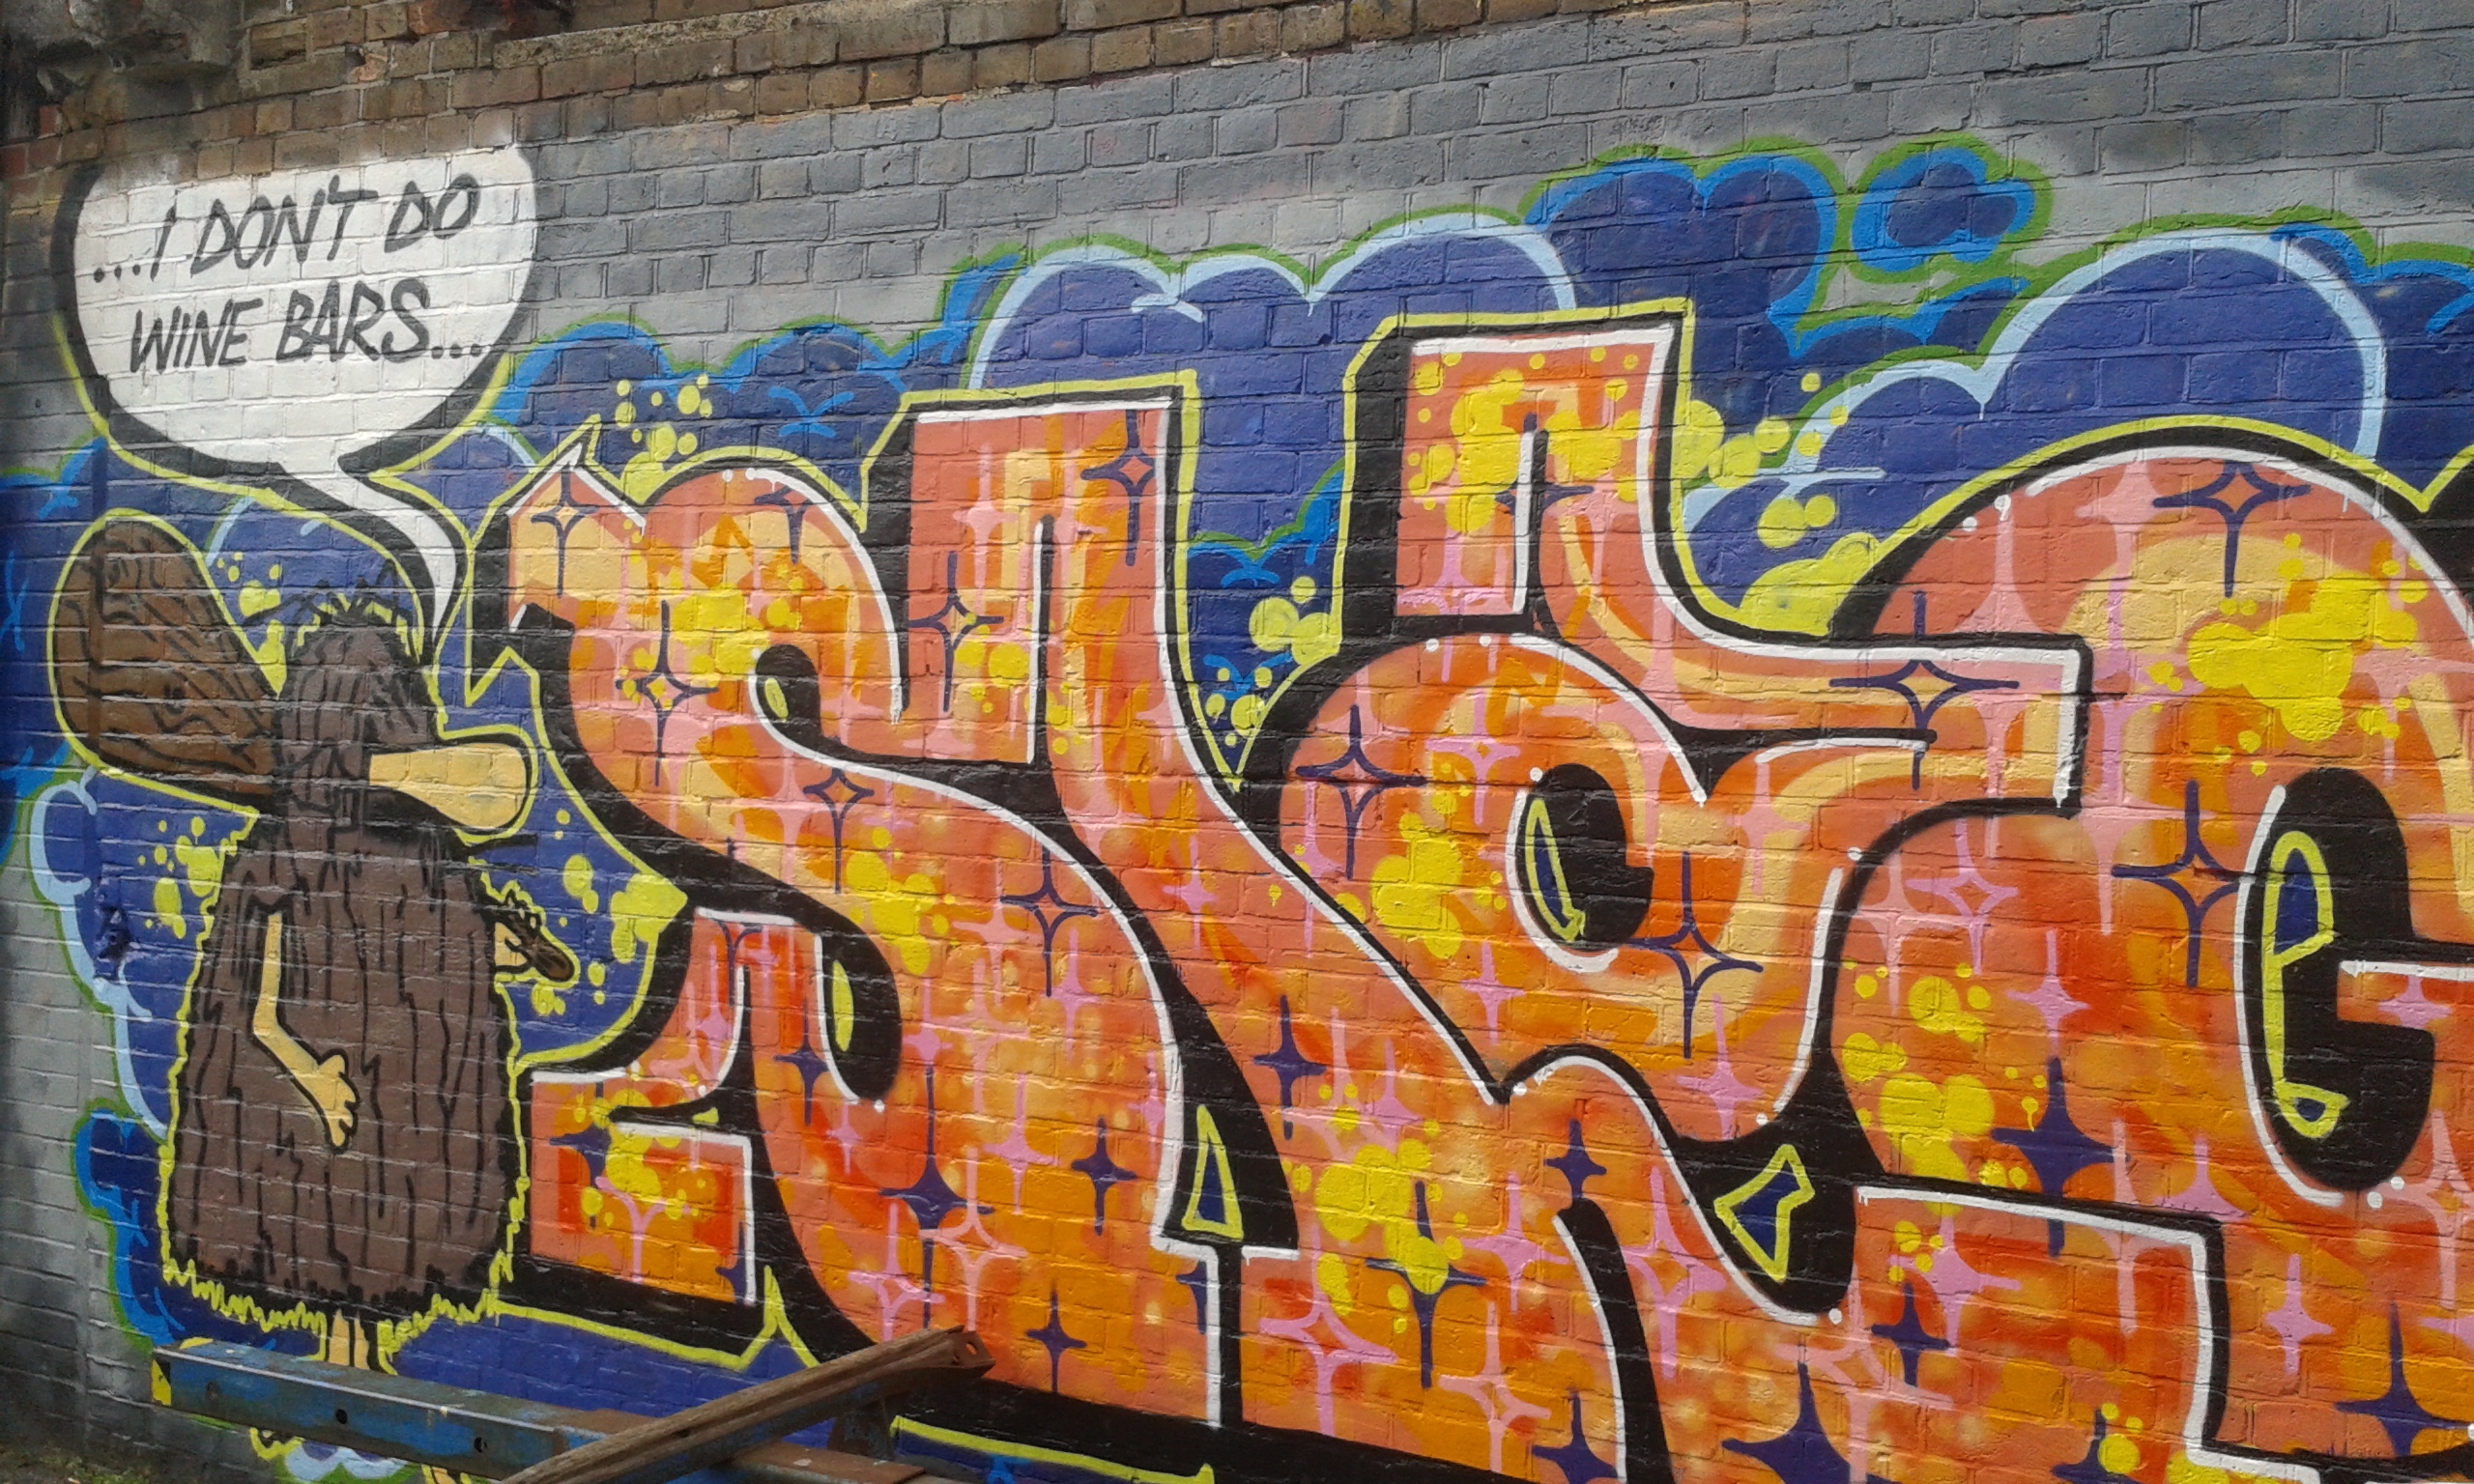 Street Art In Brighton - Cool Graffiti